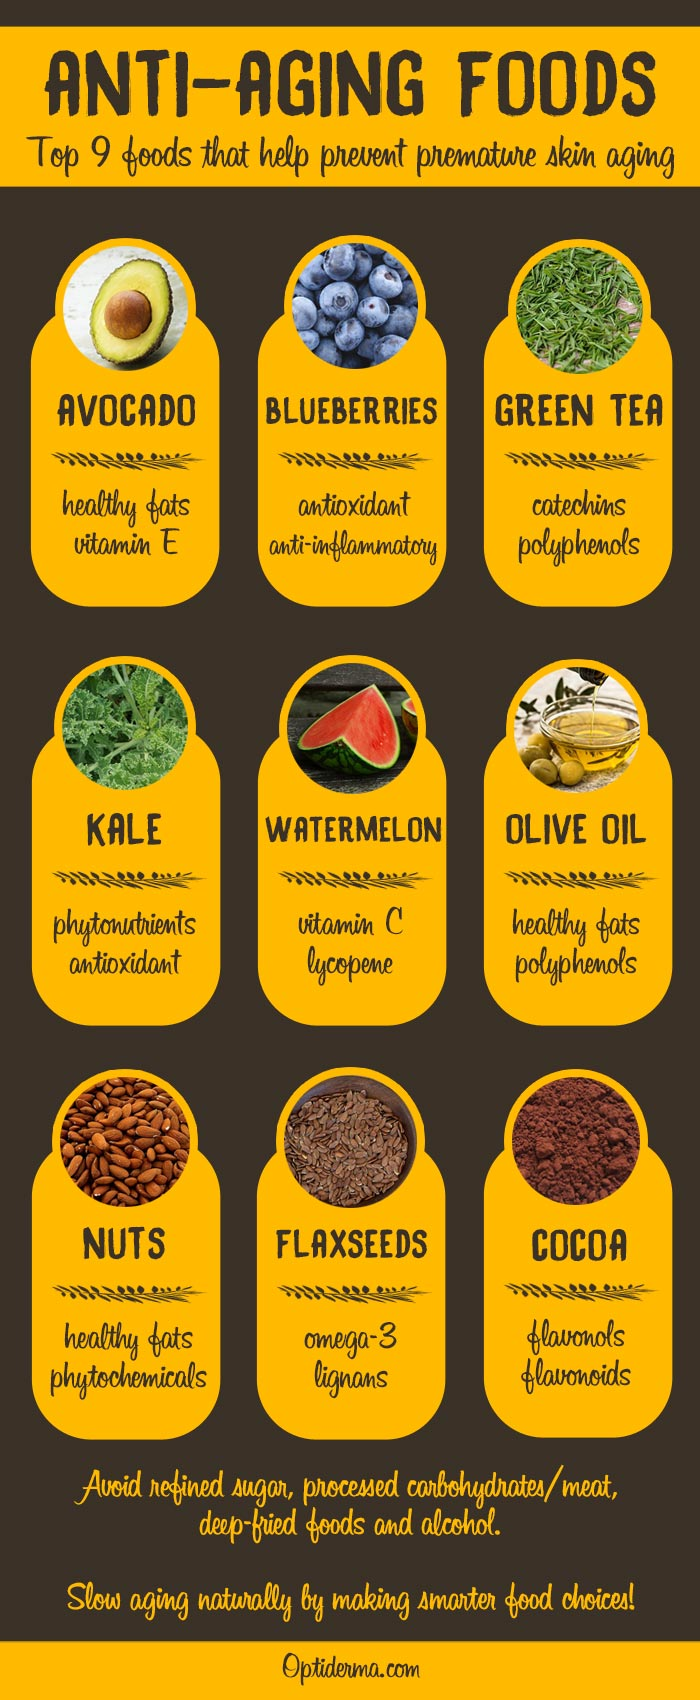 Top 9 Anti-Aging Foods